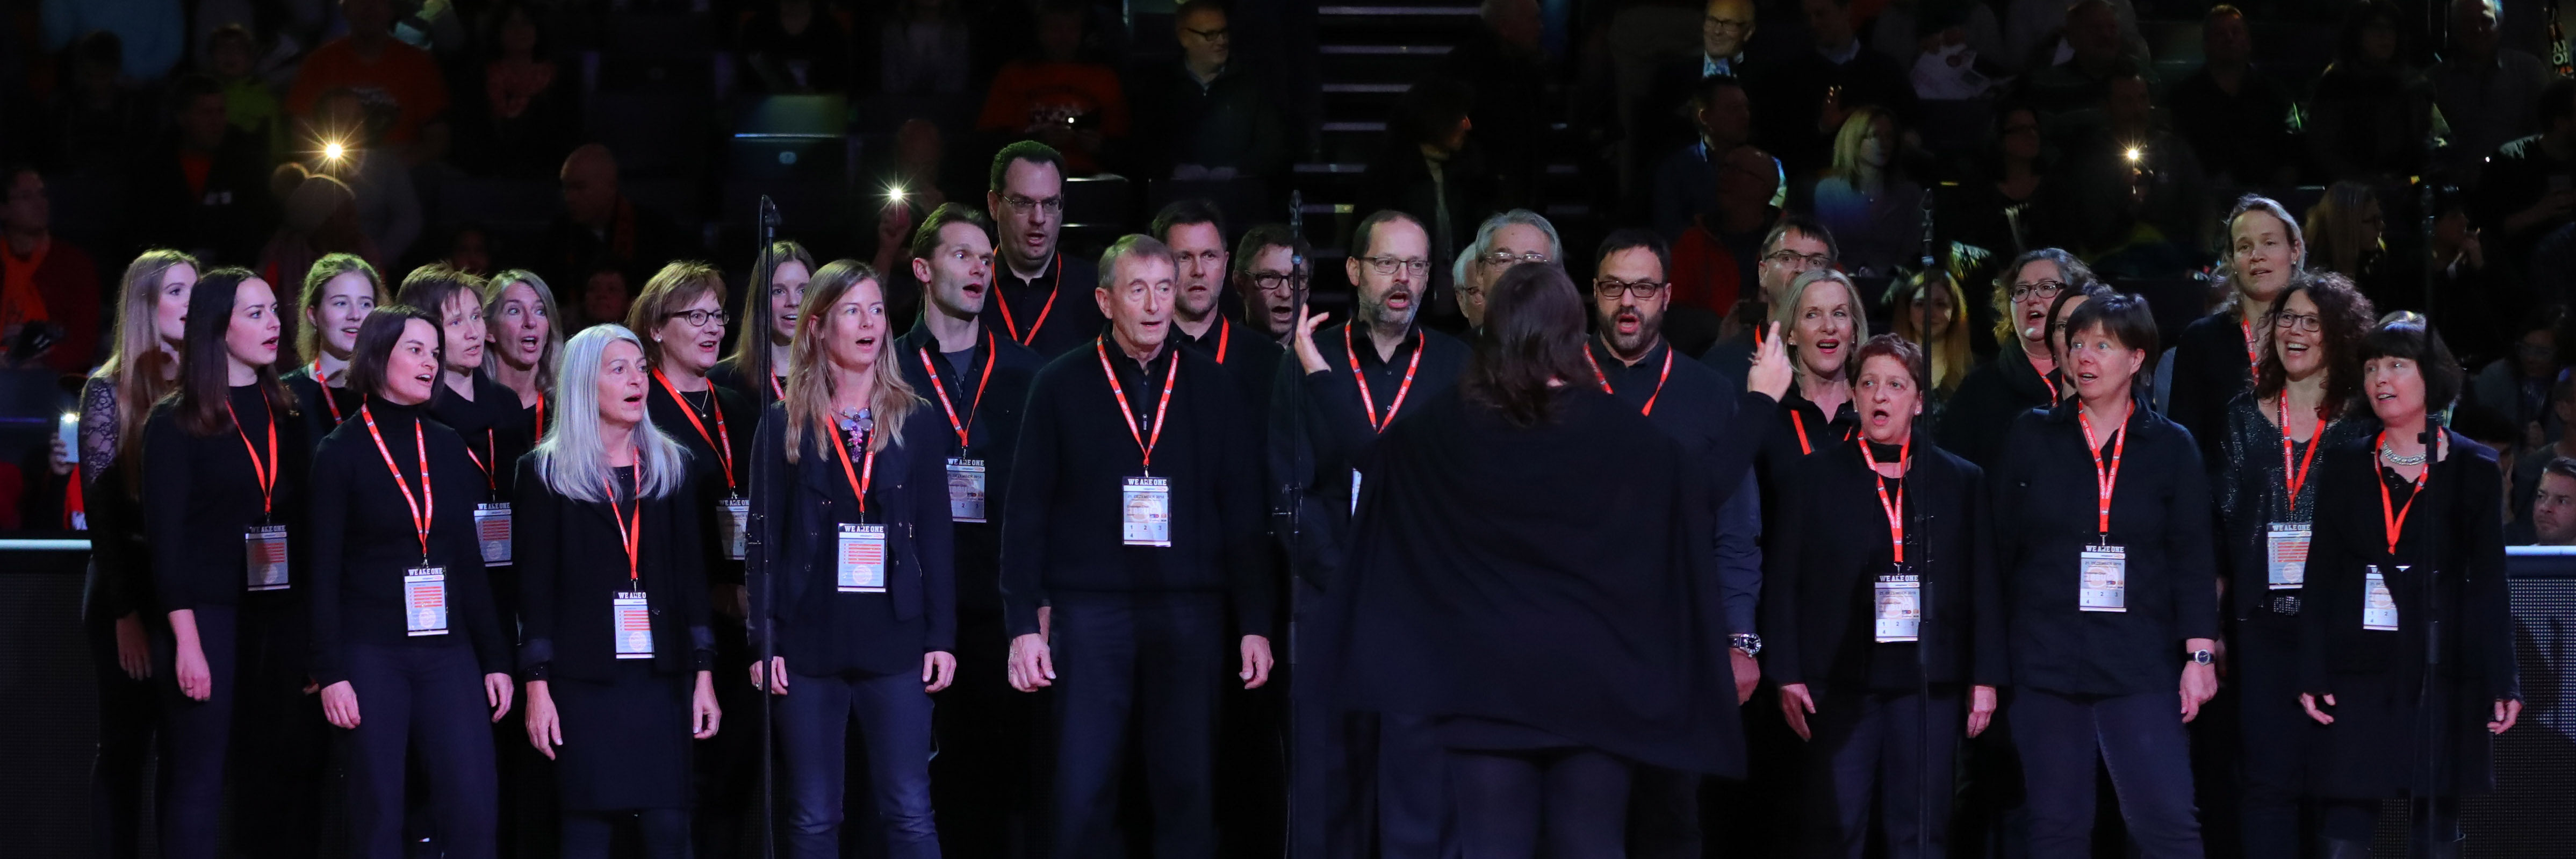 Oratorienchor Ulm, Ratiopharm Arena